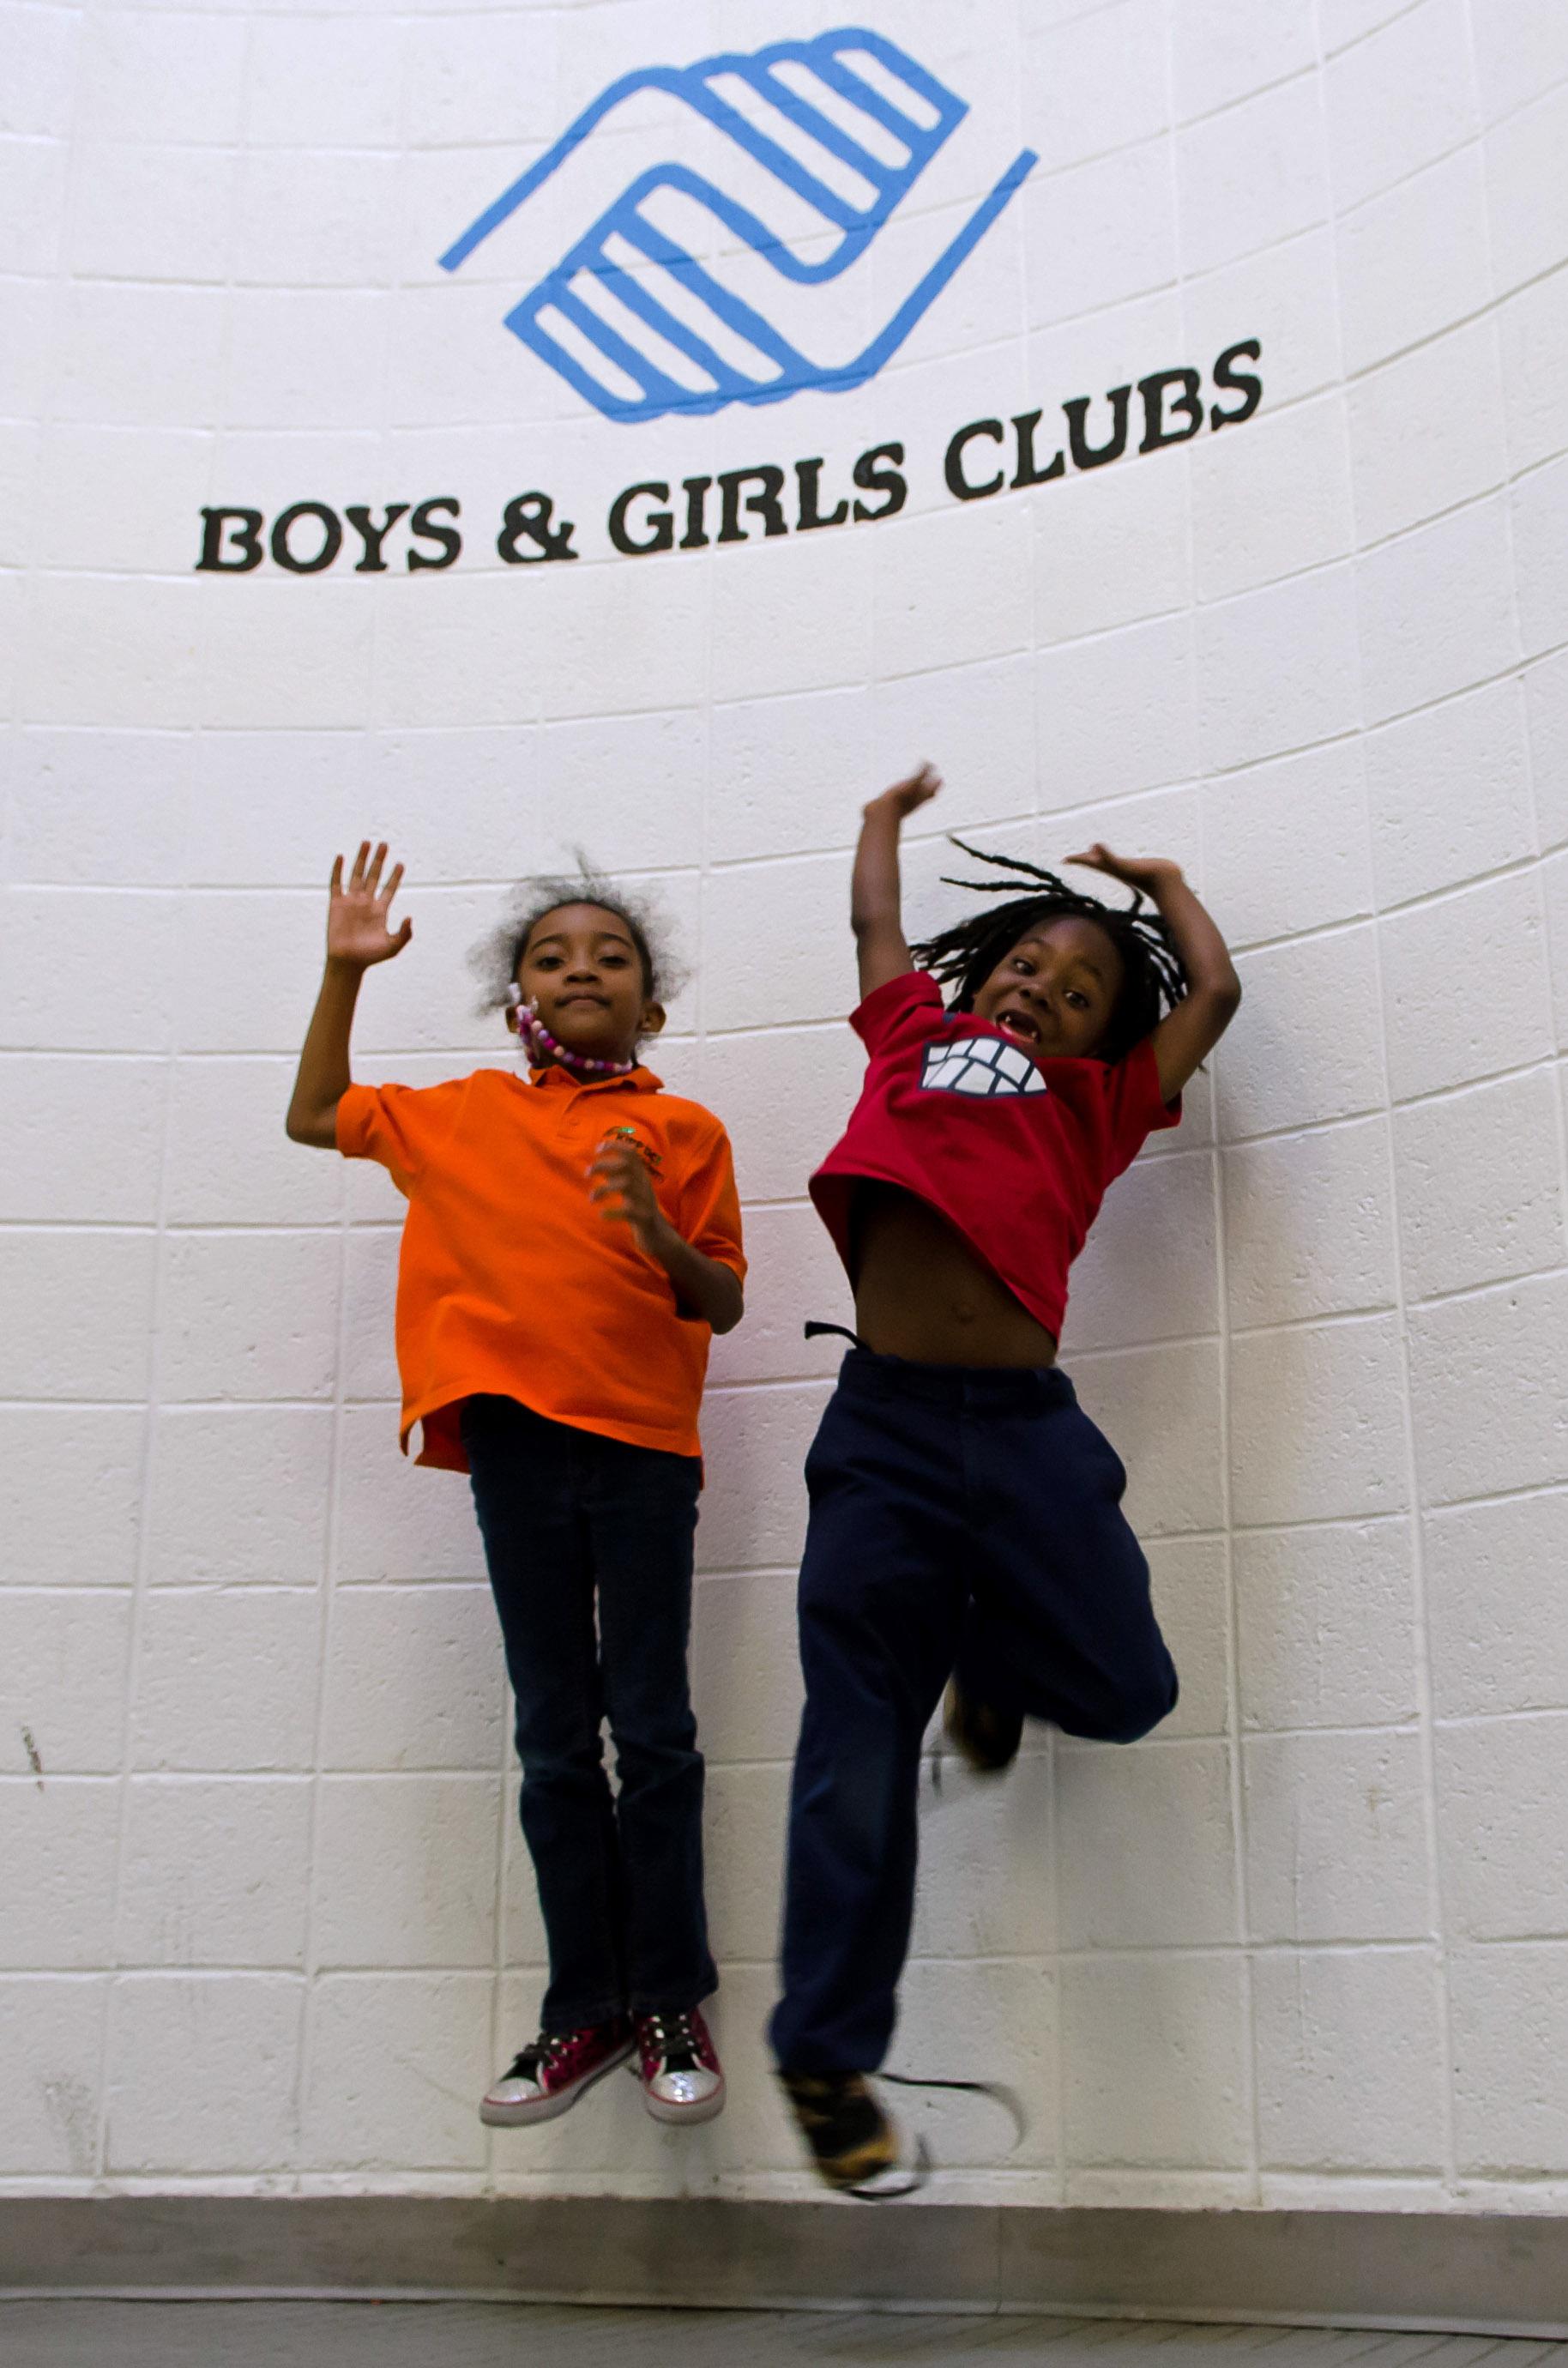 Boys and Girls Clubs of Greater Washington, Clubhouse #14, Washington, DC.